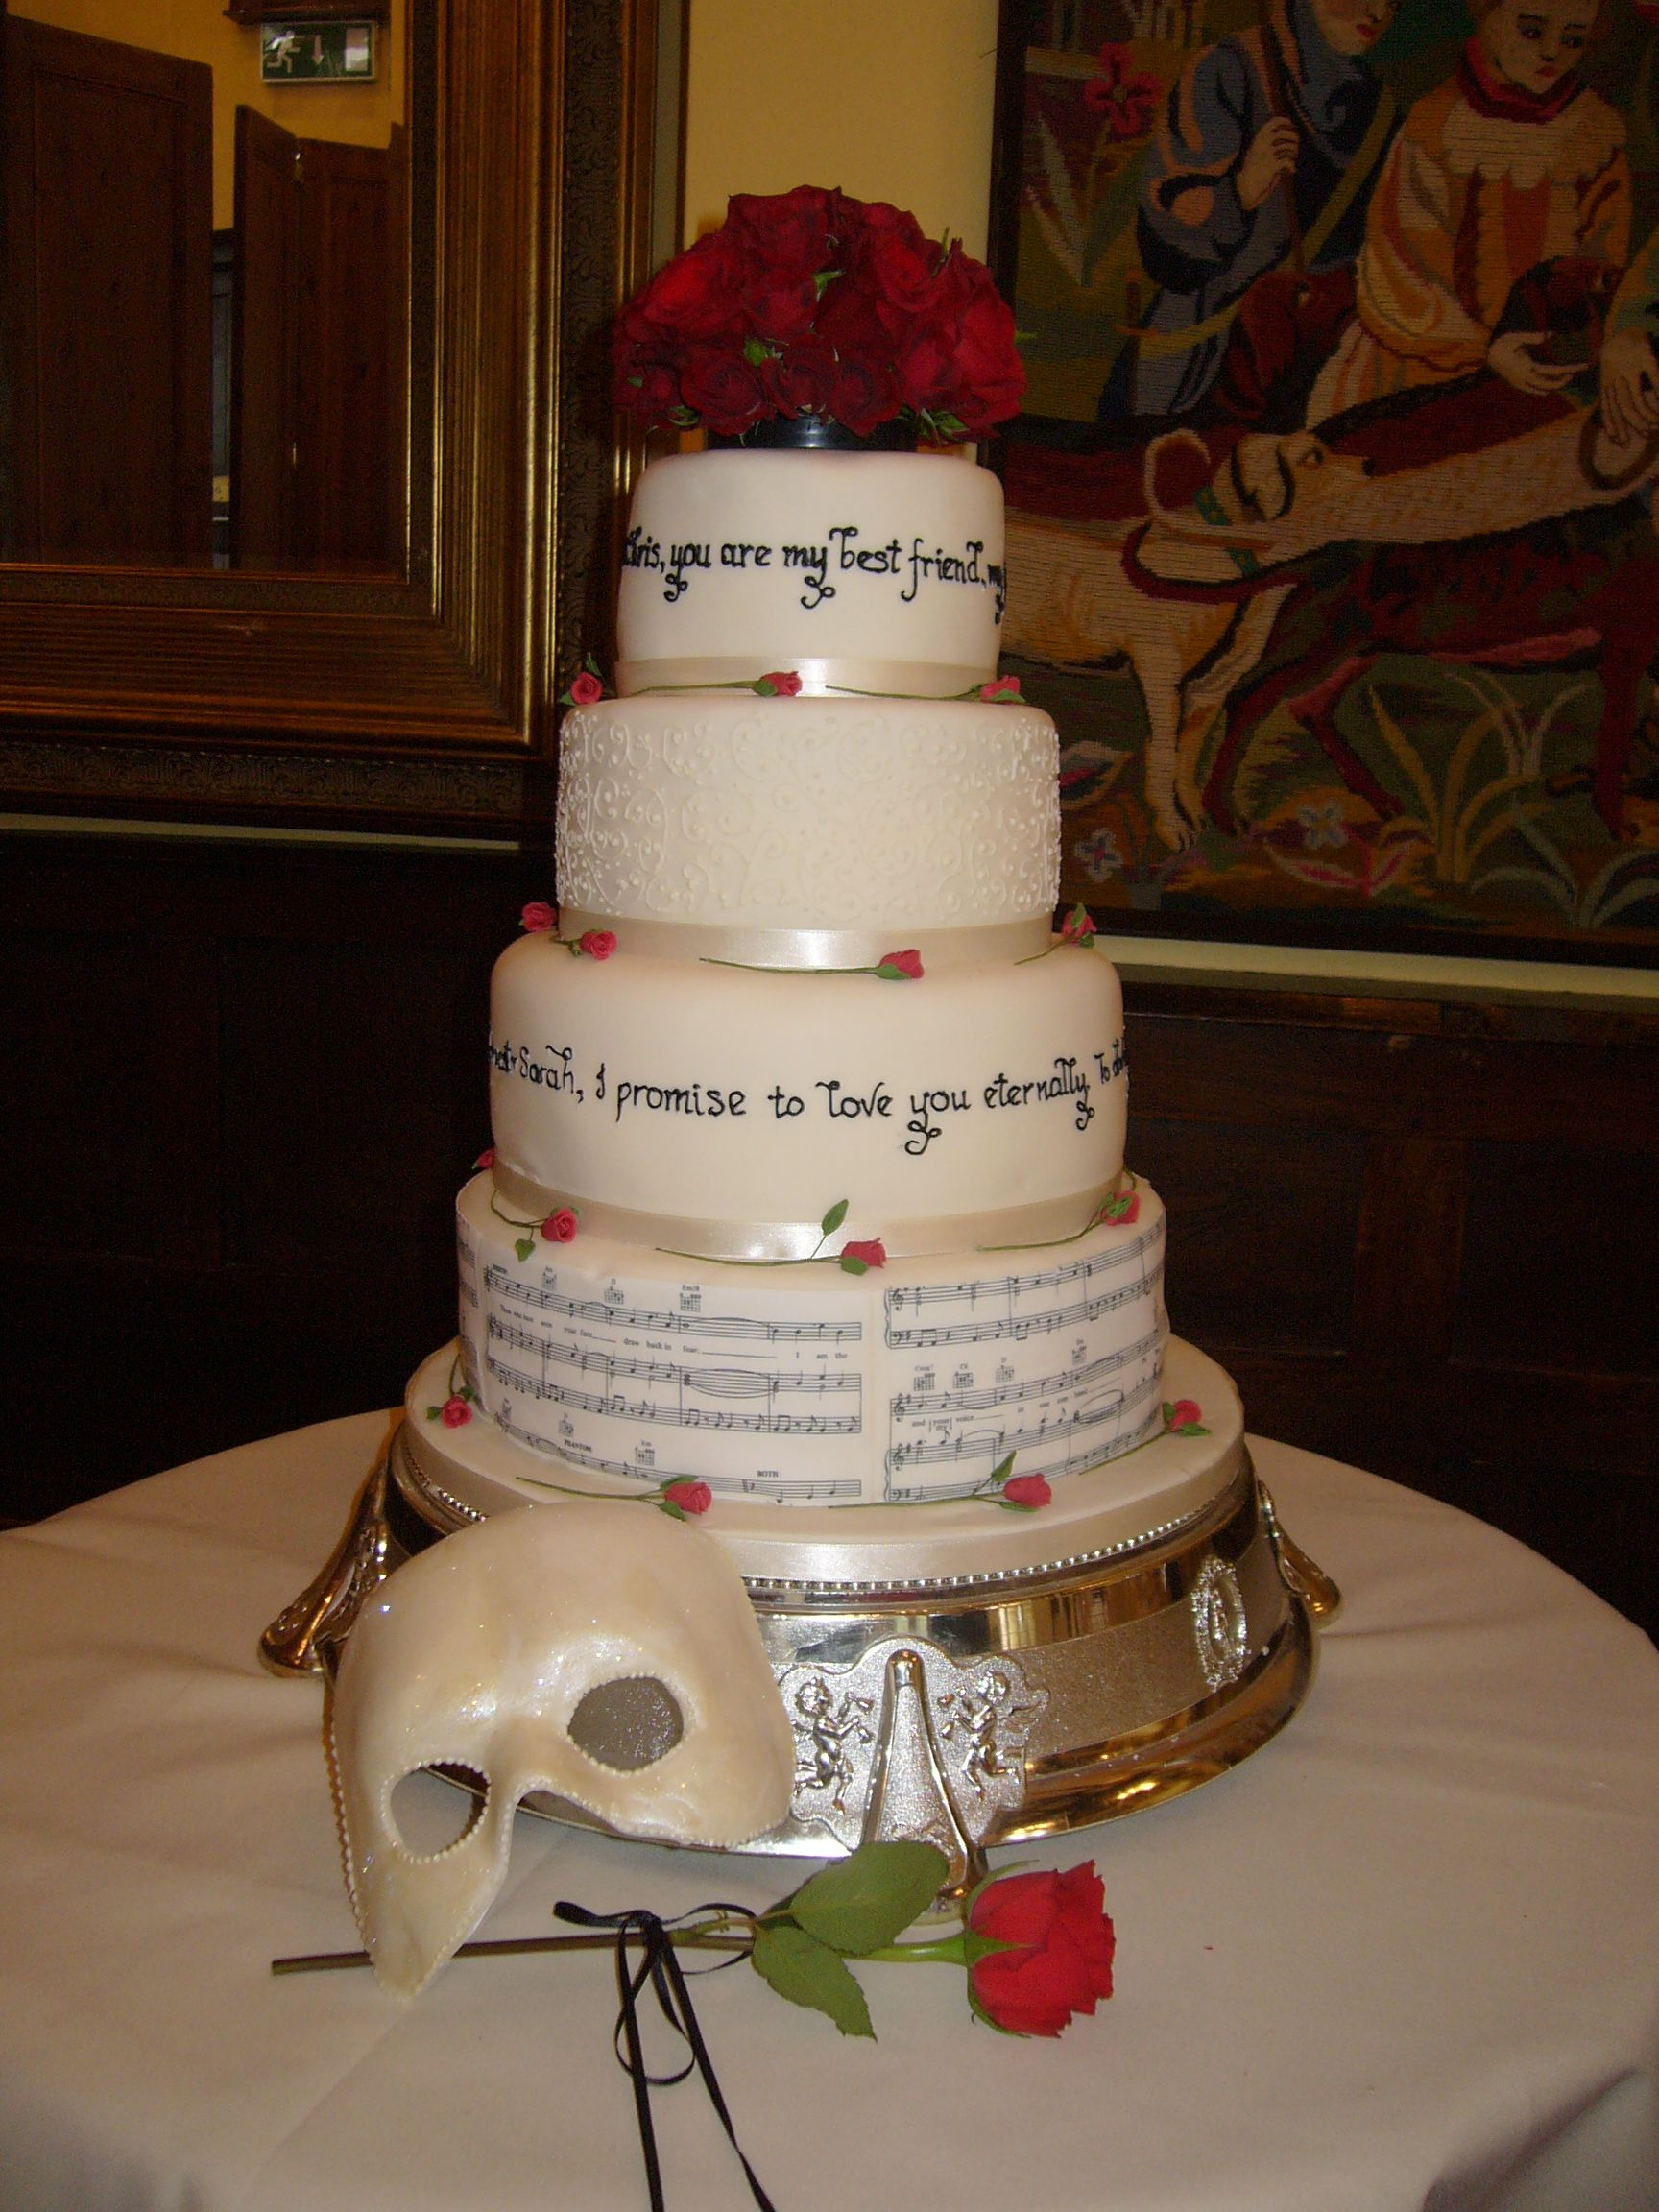 Phantom Of The Opera Wedding Cake With Phantom Music On Sugar Sheets